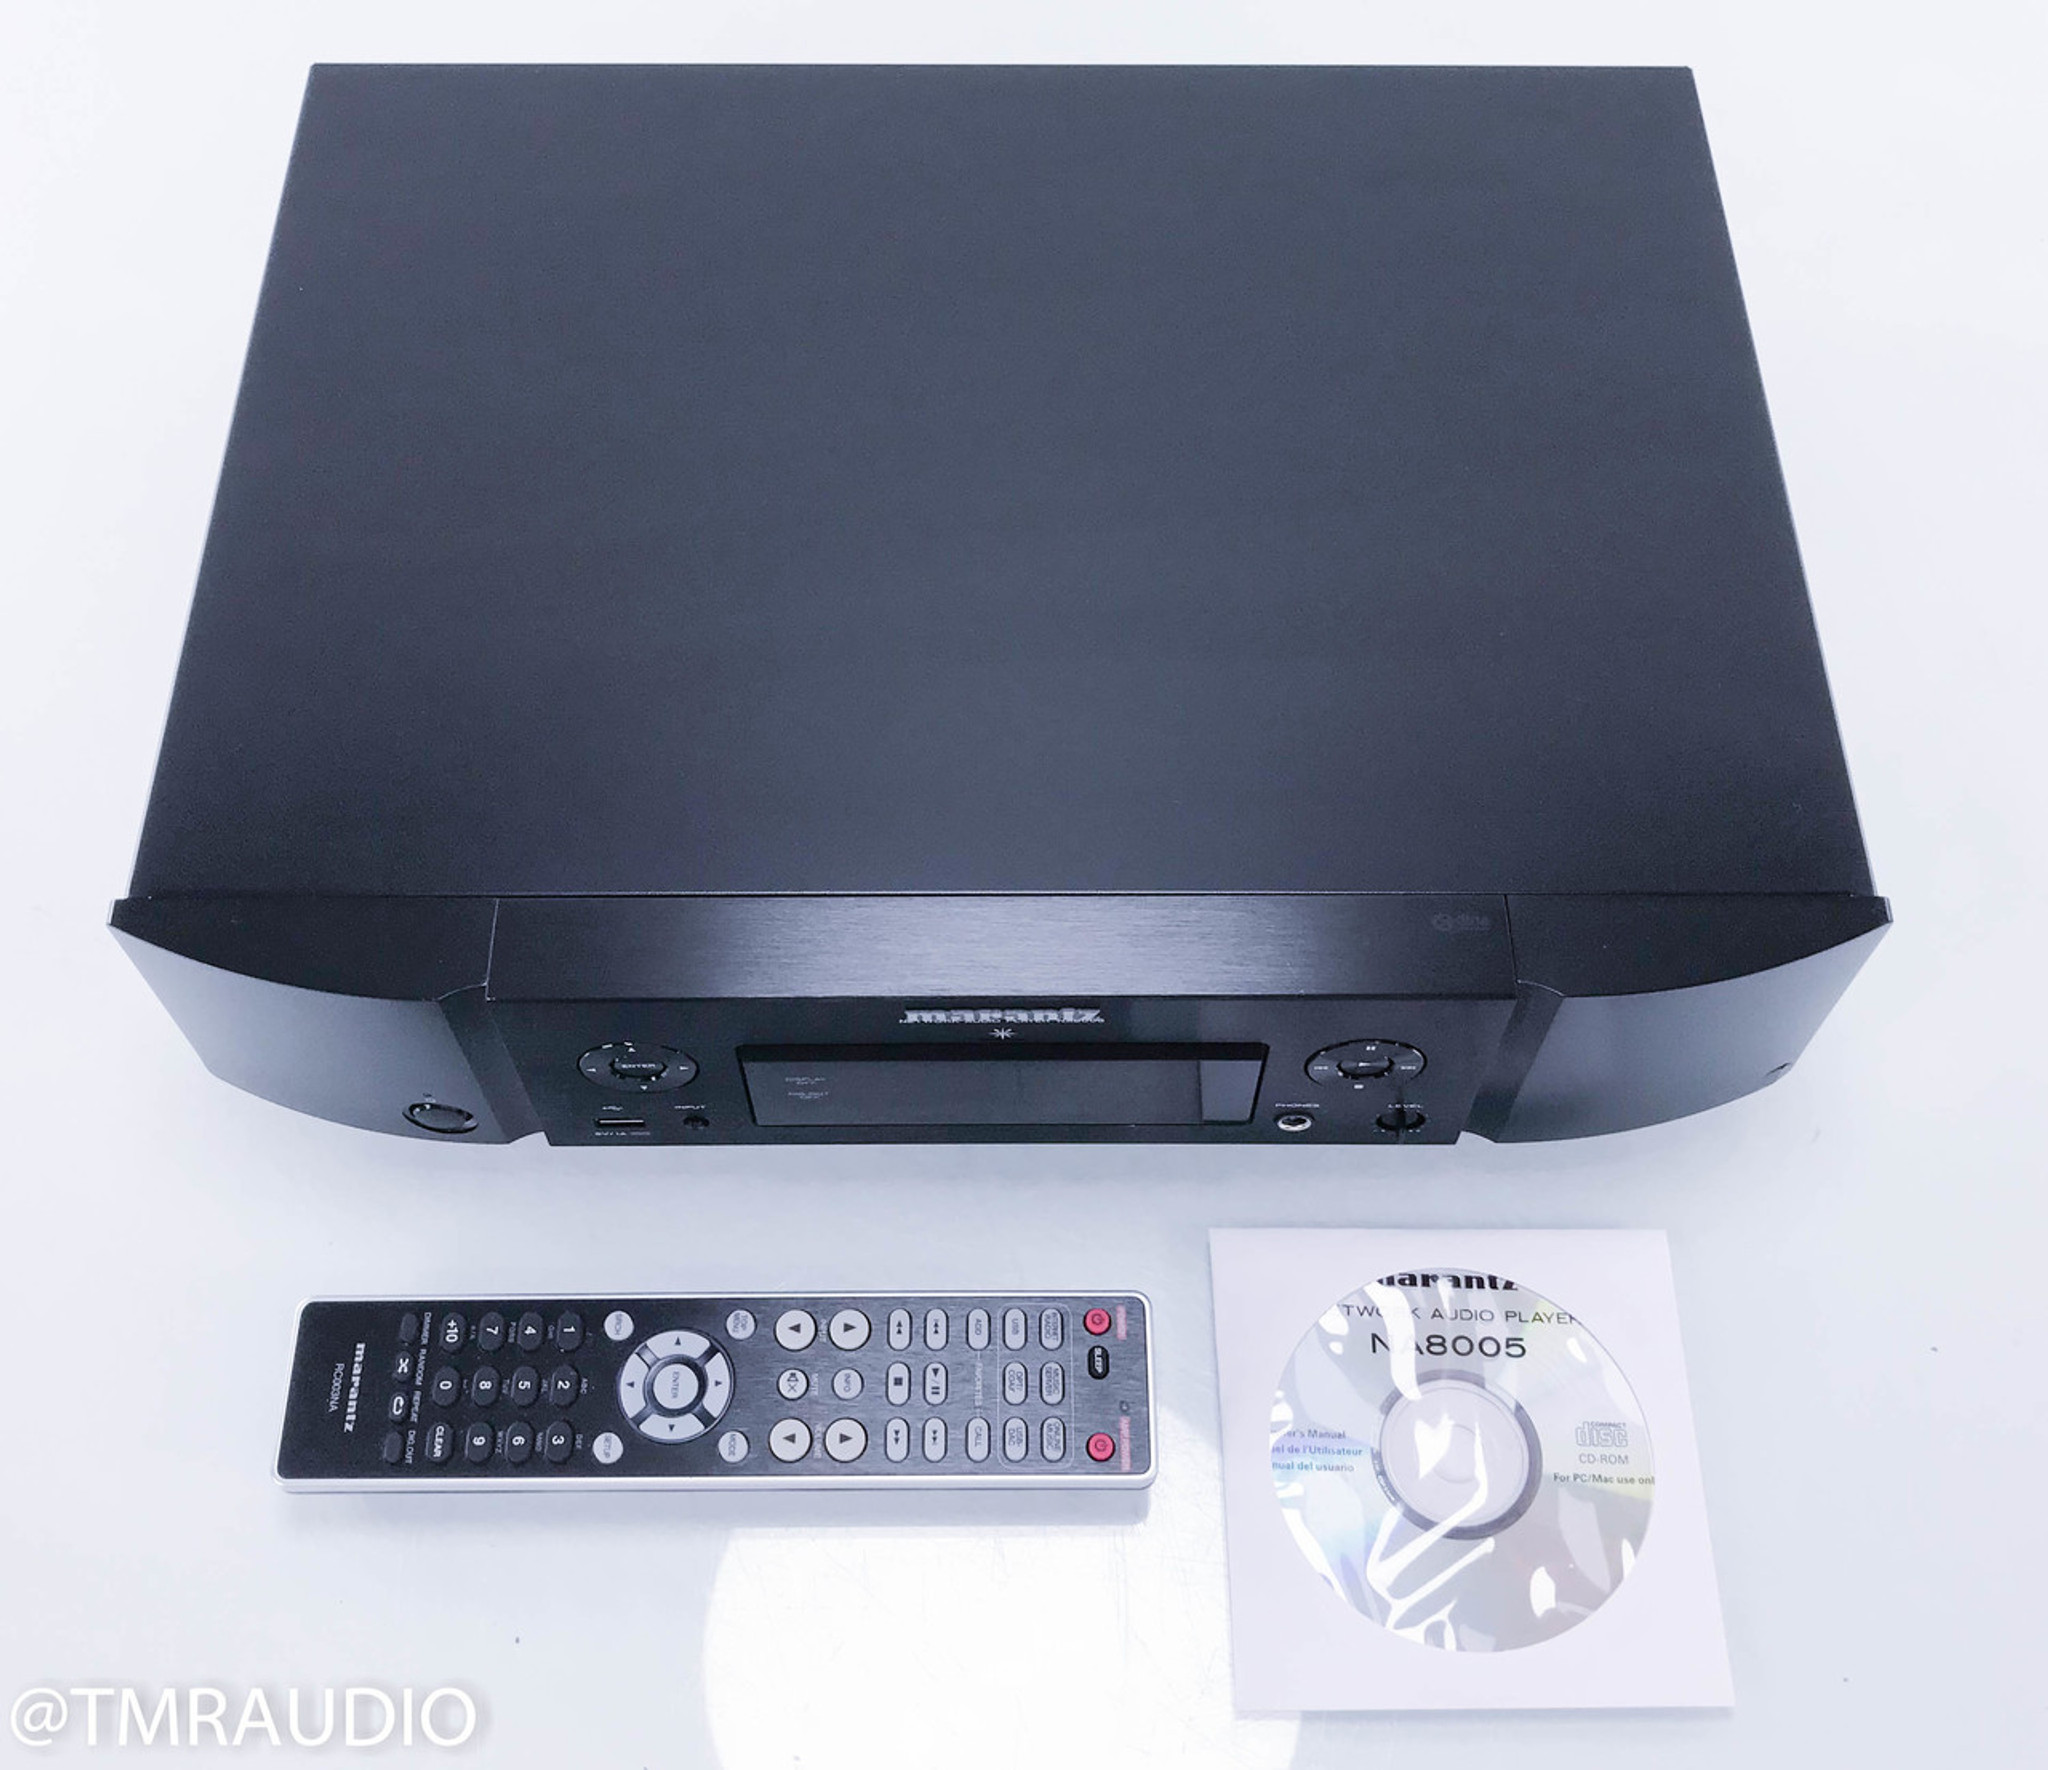 Marantz NA8005 Network Audio Player